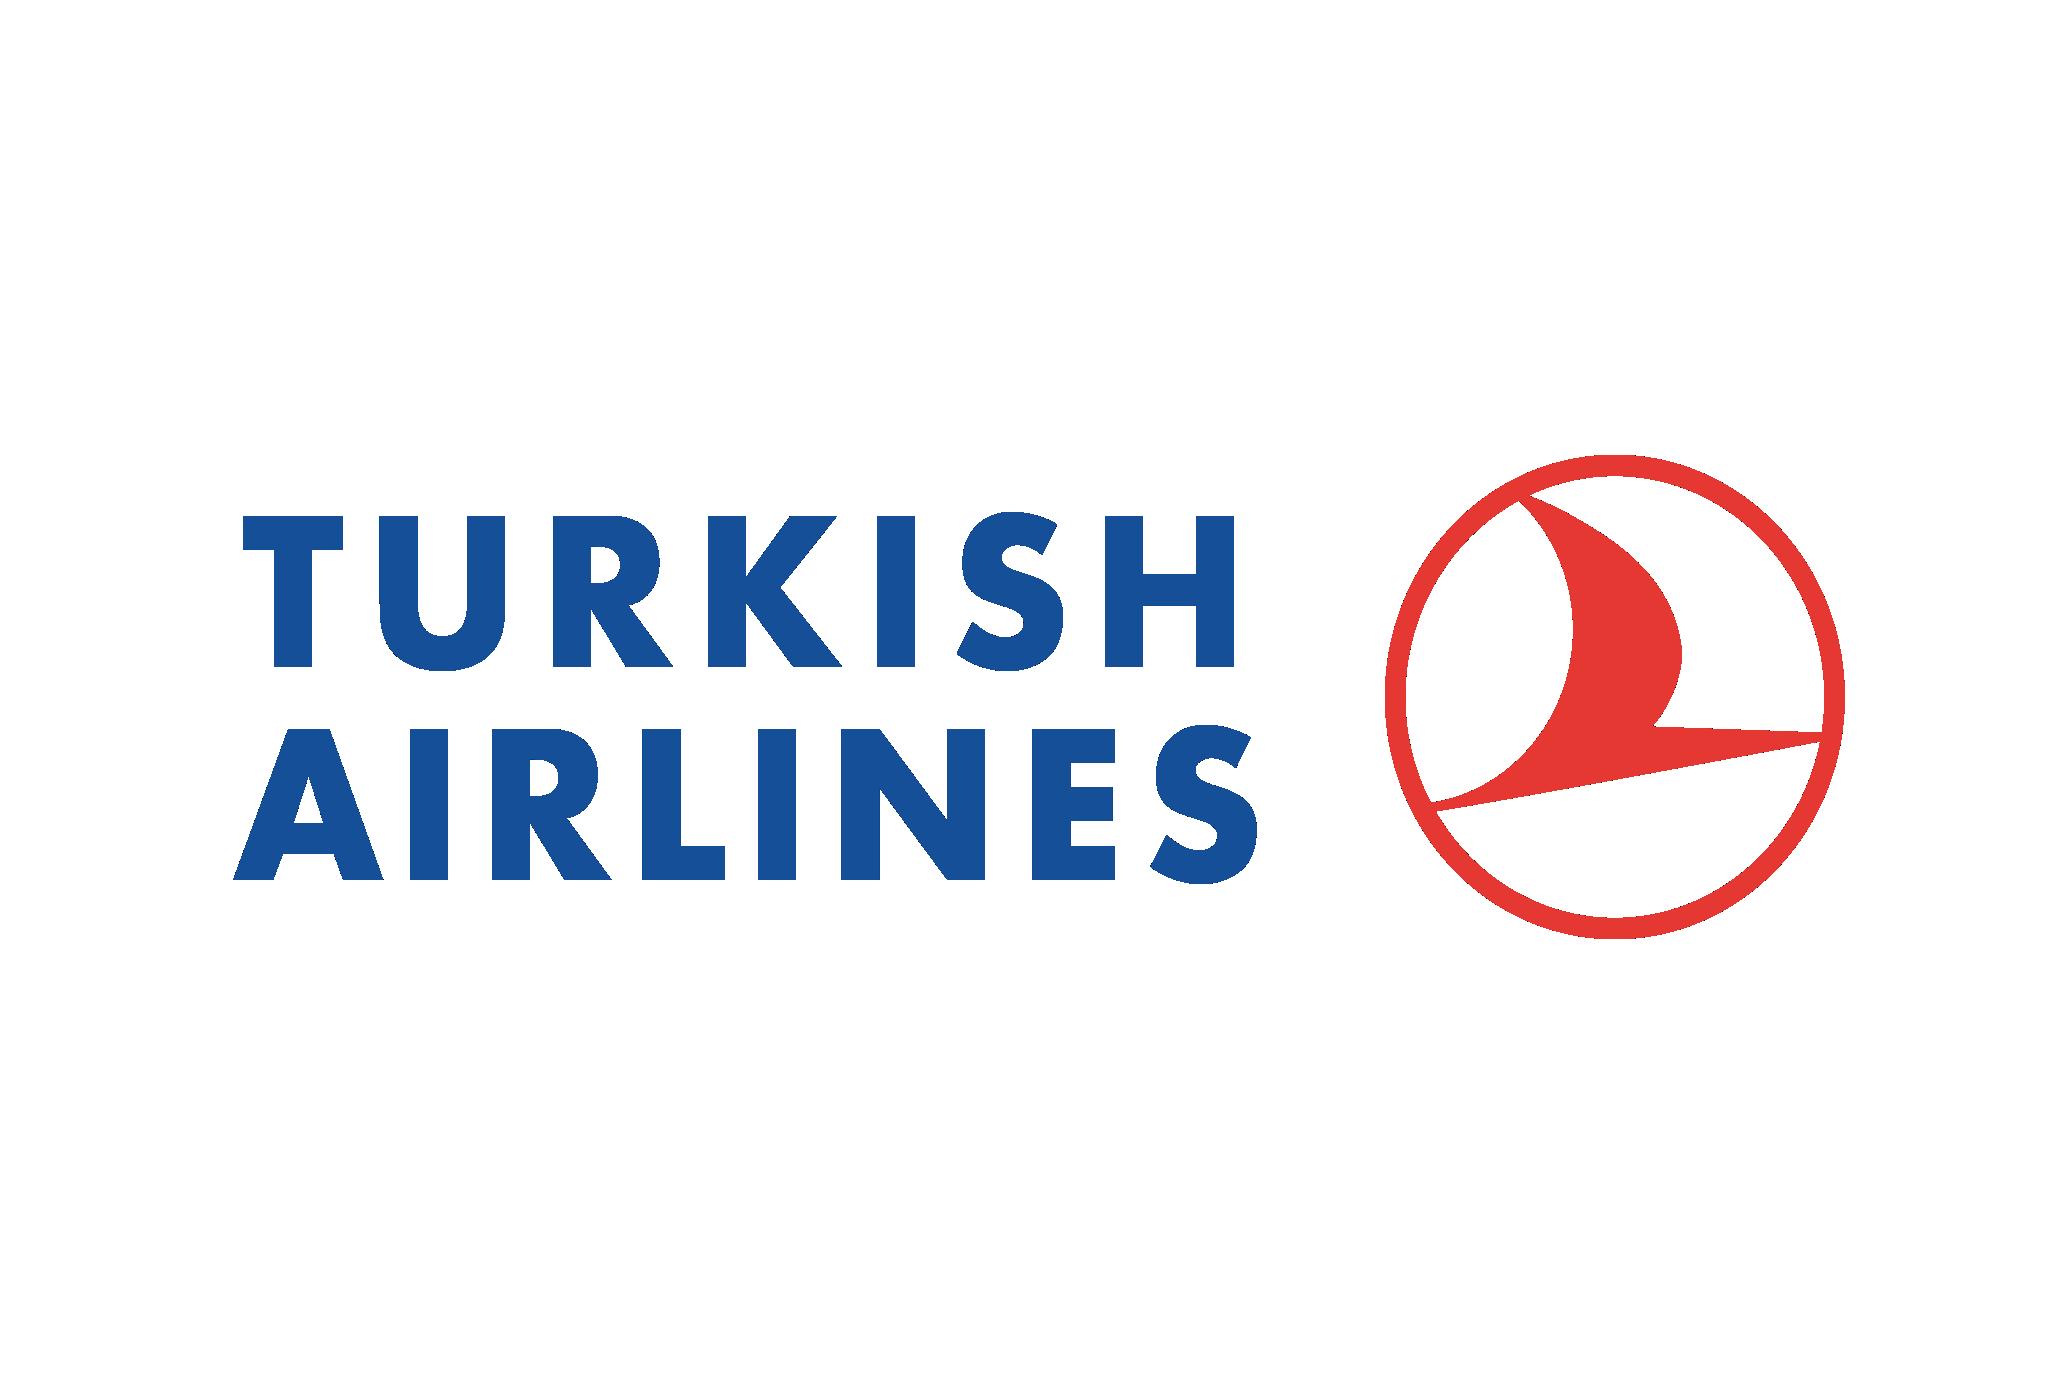 turkish airlines logos png #2537